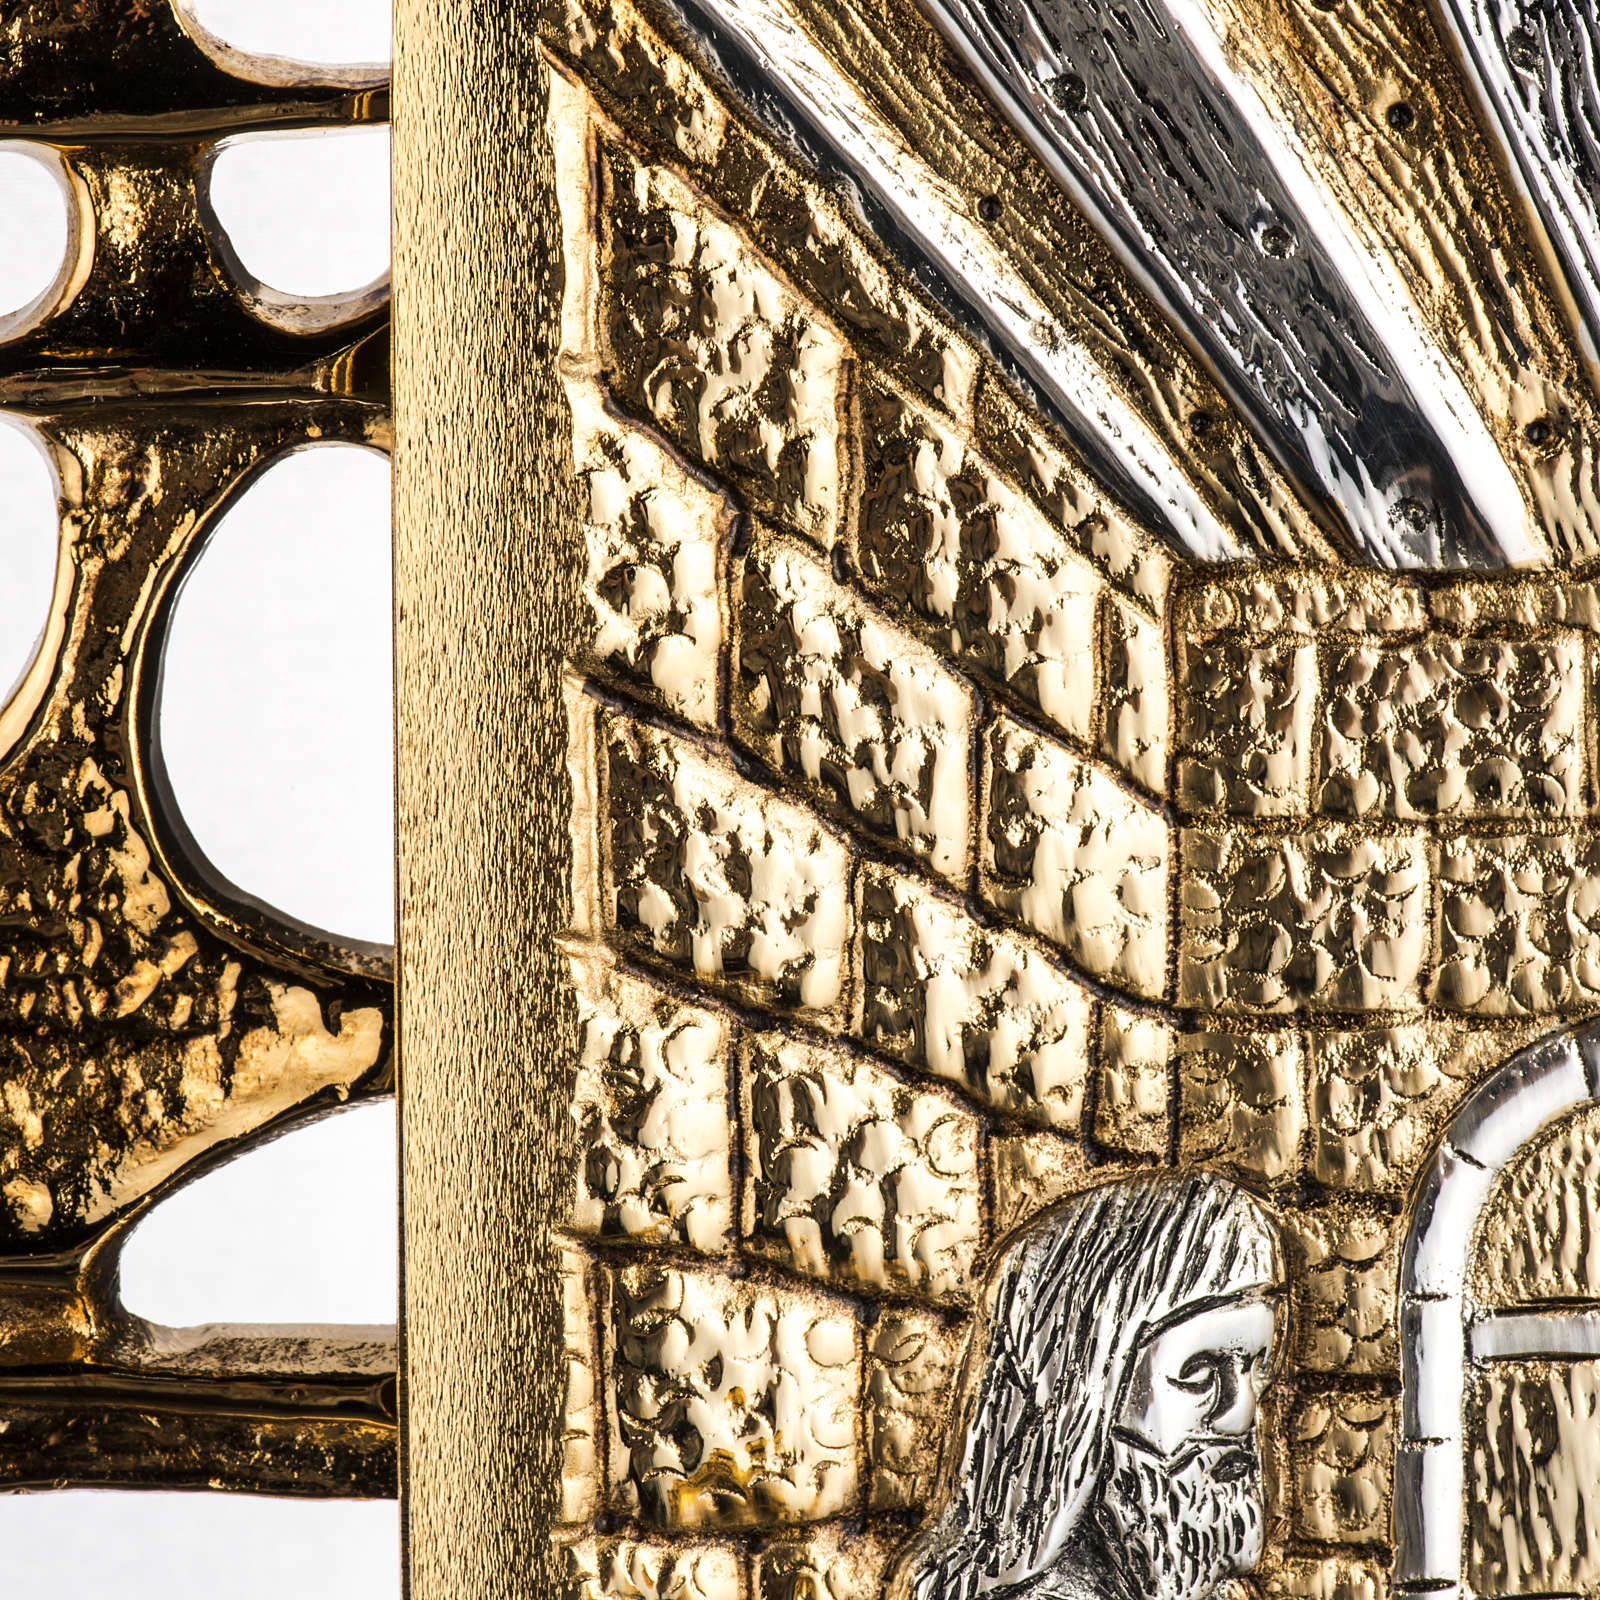 Tabernacle laiton fondu Souper à Emmaus 4